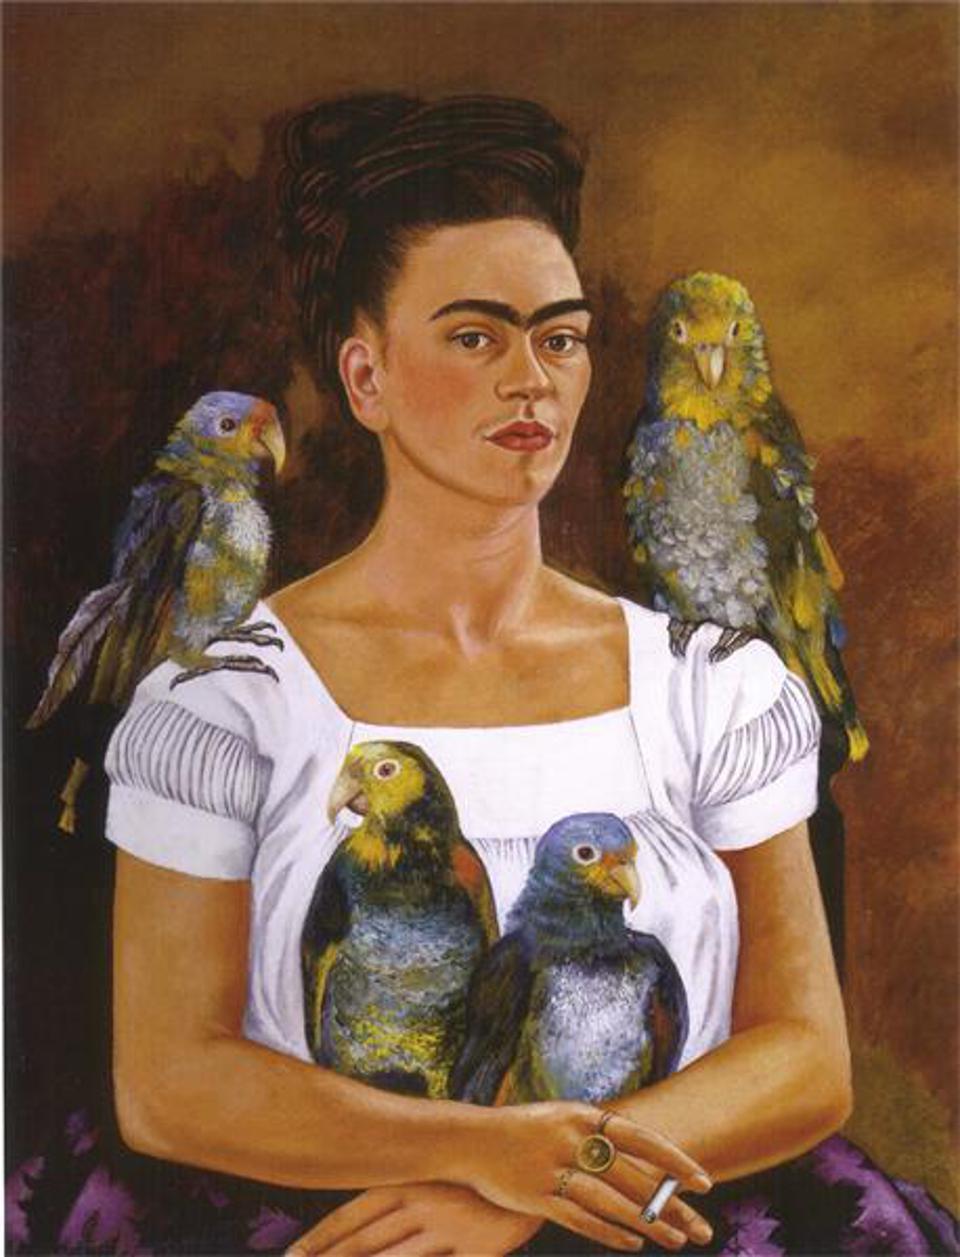 © 2020 BANCO DE MÉXICO DIEGO RIVERA FRIDA KAHLO MUSEUMS TRUST, MEXICO, D.F. / ARTISTS RIGHTS SOCIETY (ARS), NEW YORK